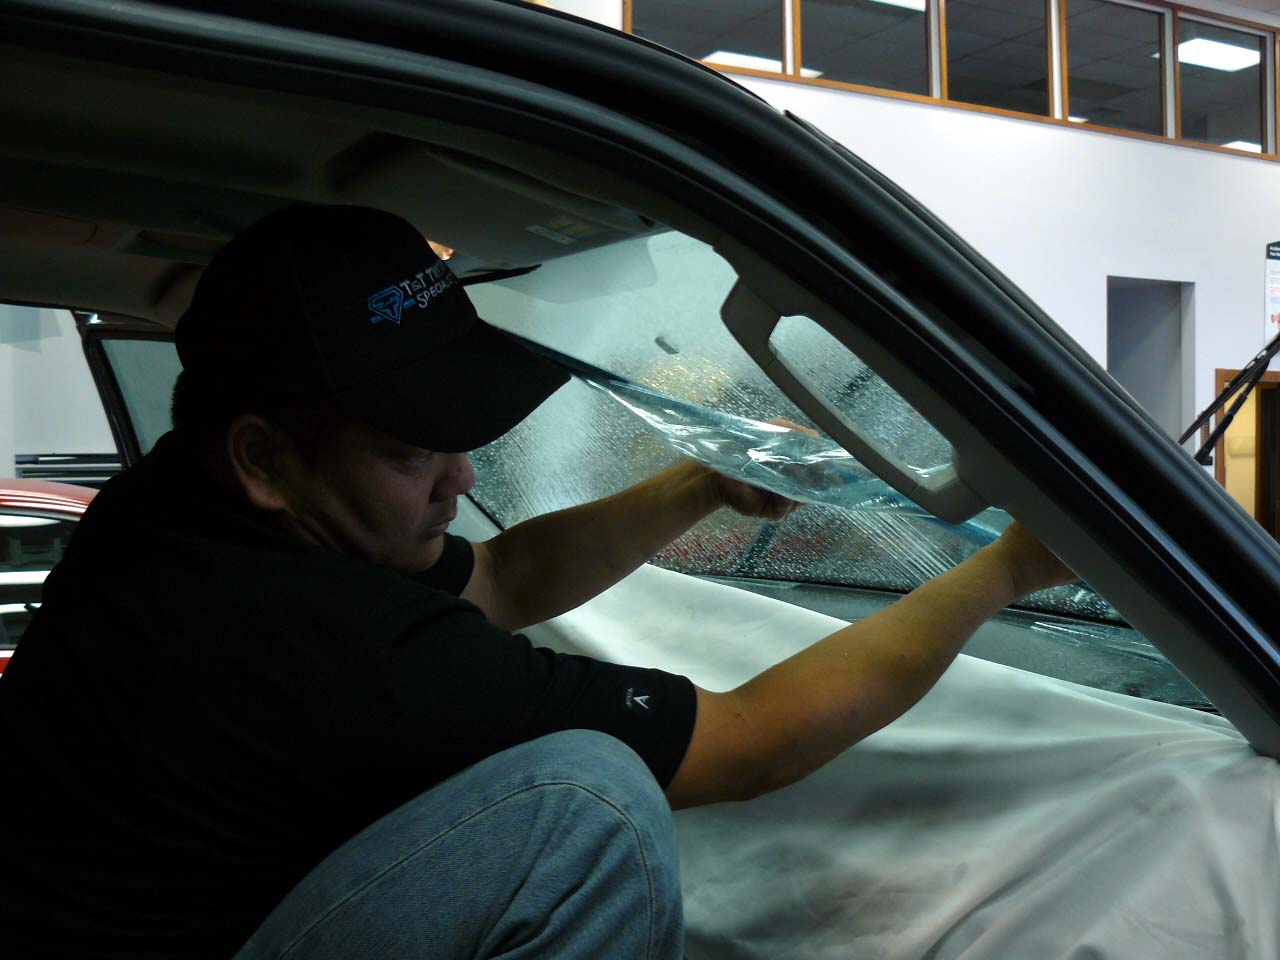 new legal clear heat blocking front windshield film t. Black Bedroom Furniture Sets. Home Design Ideas